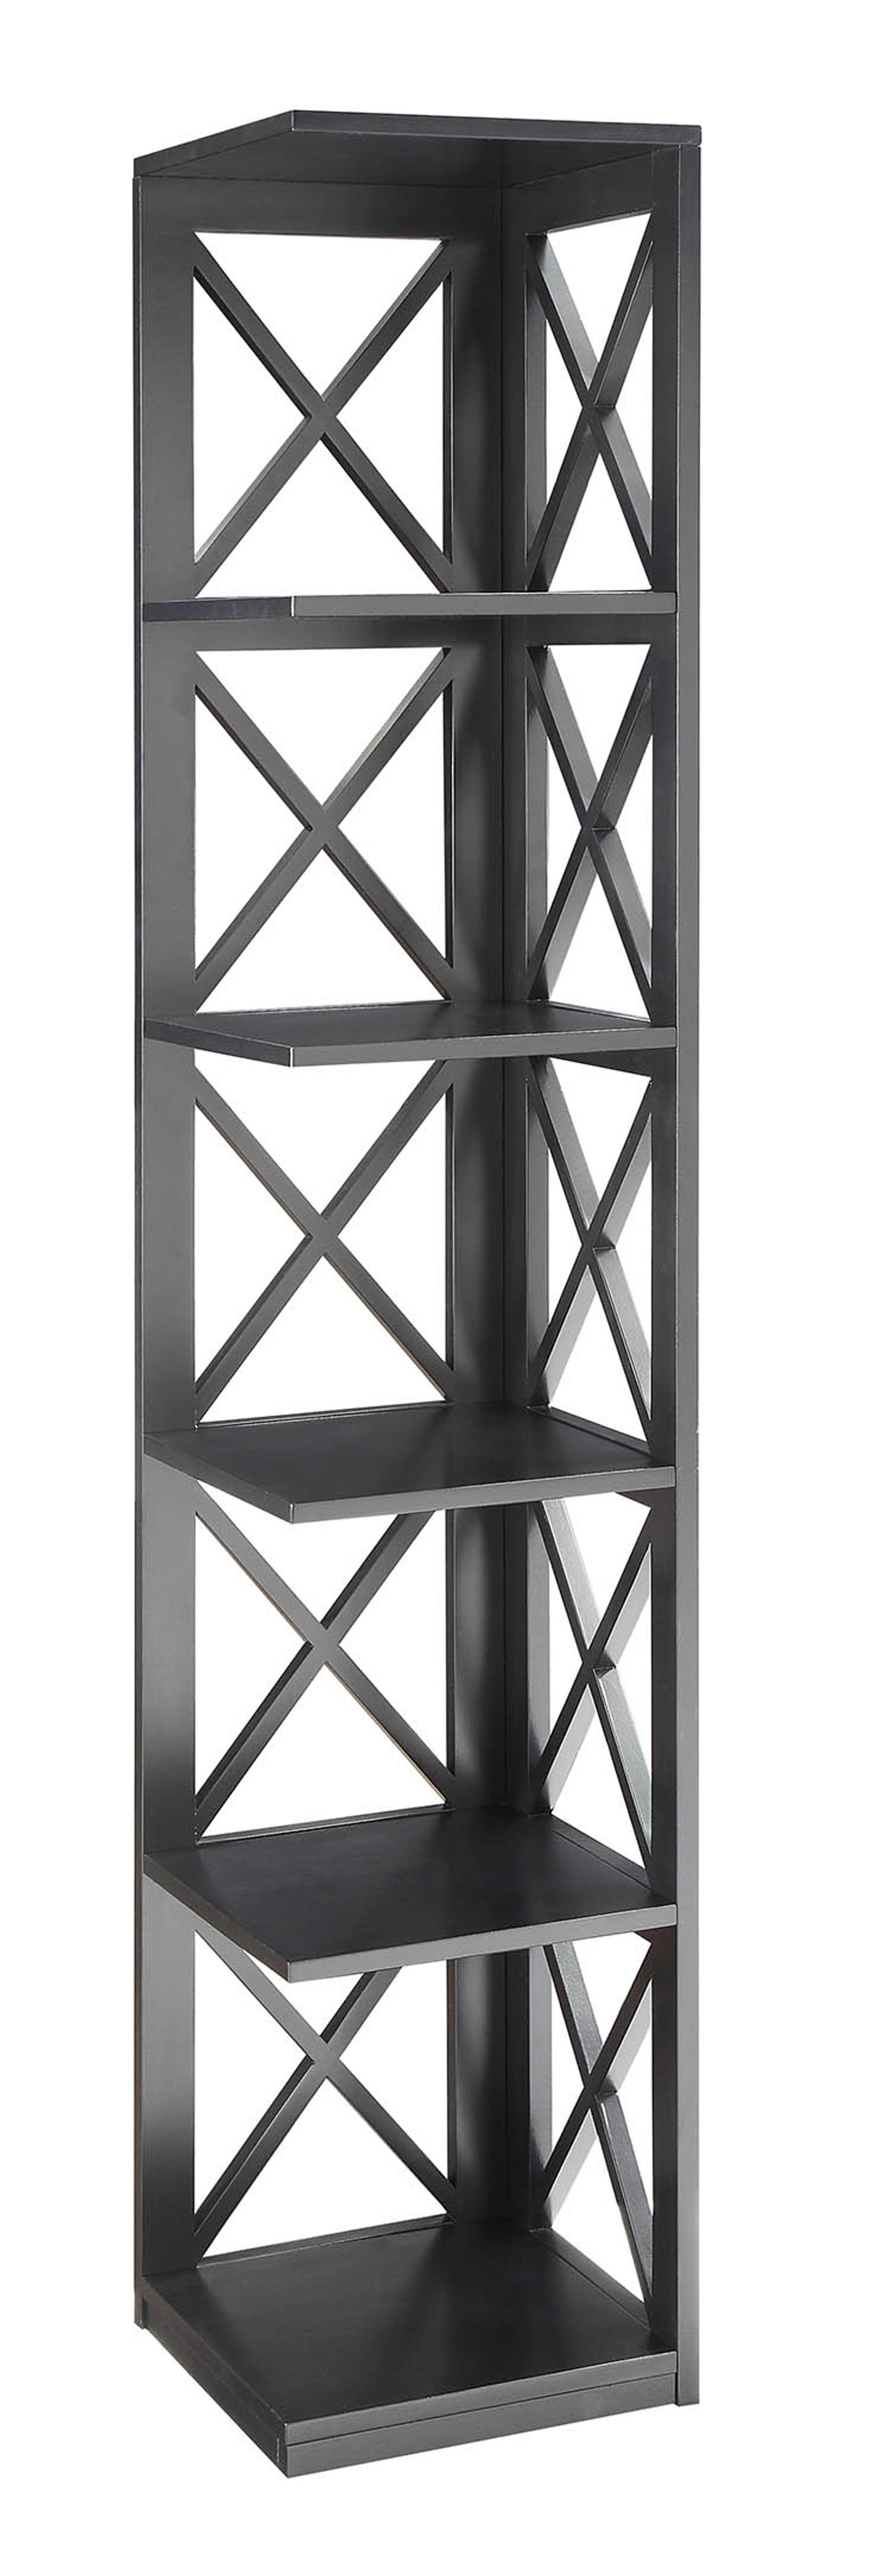 Stoneford Corner Bookcases Regarding Well Known Stoneford Corner Bookcase (View 8 of 20)